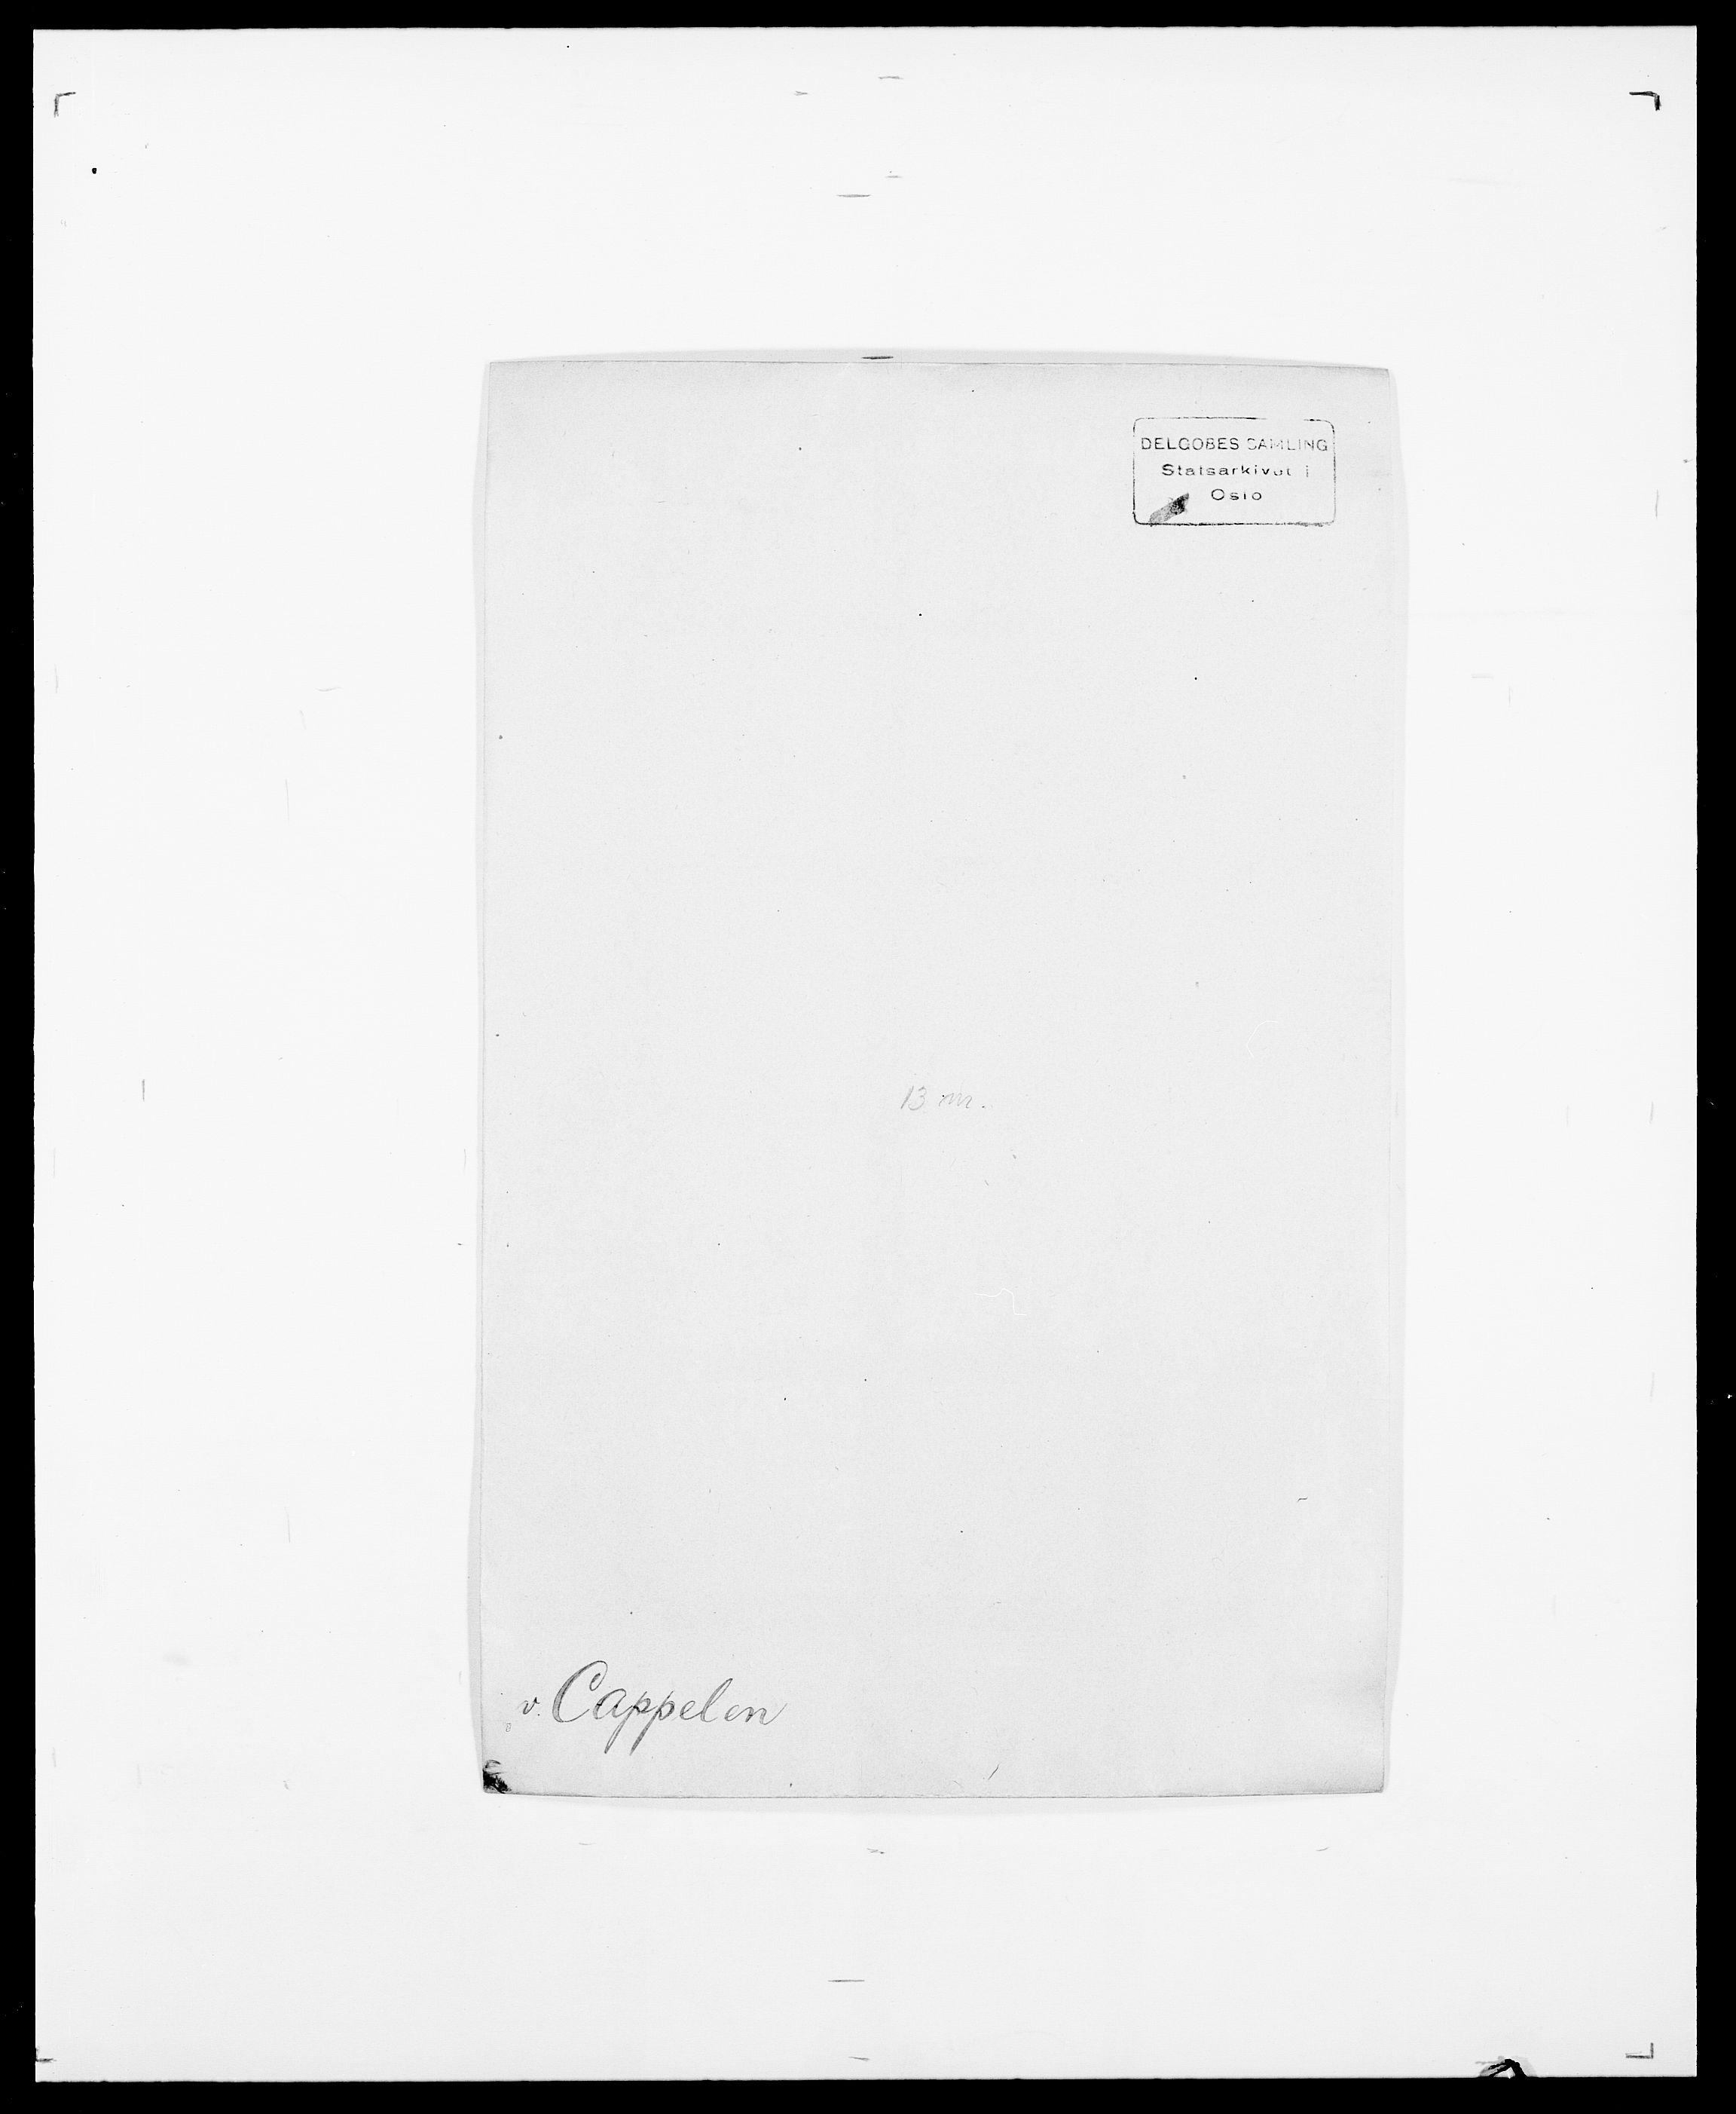 SAO, Delgobe, Charles Antoine - samling, D/Da/L0008: Capjon - Dagenbolt, s. 13